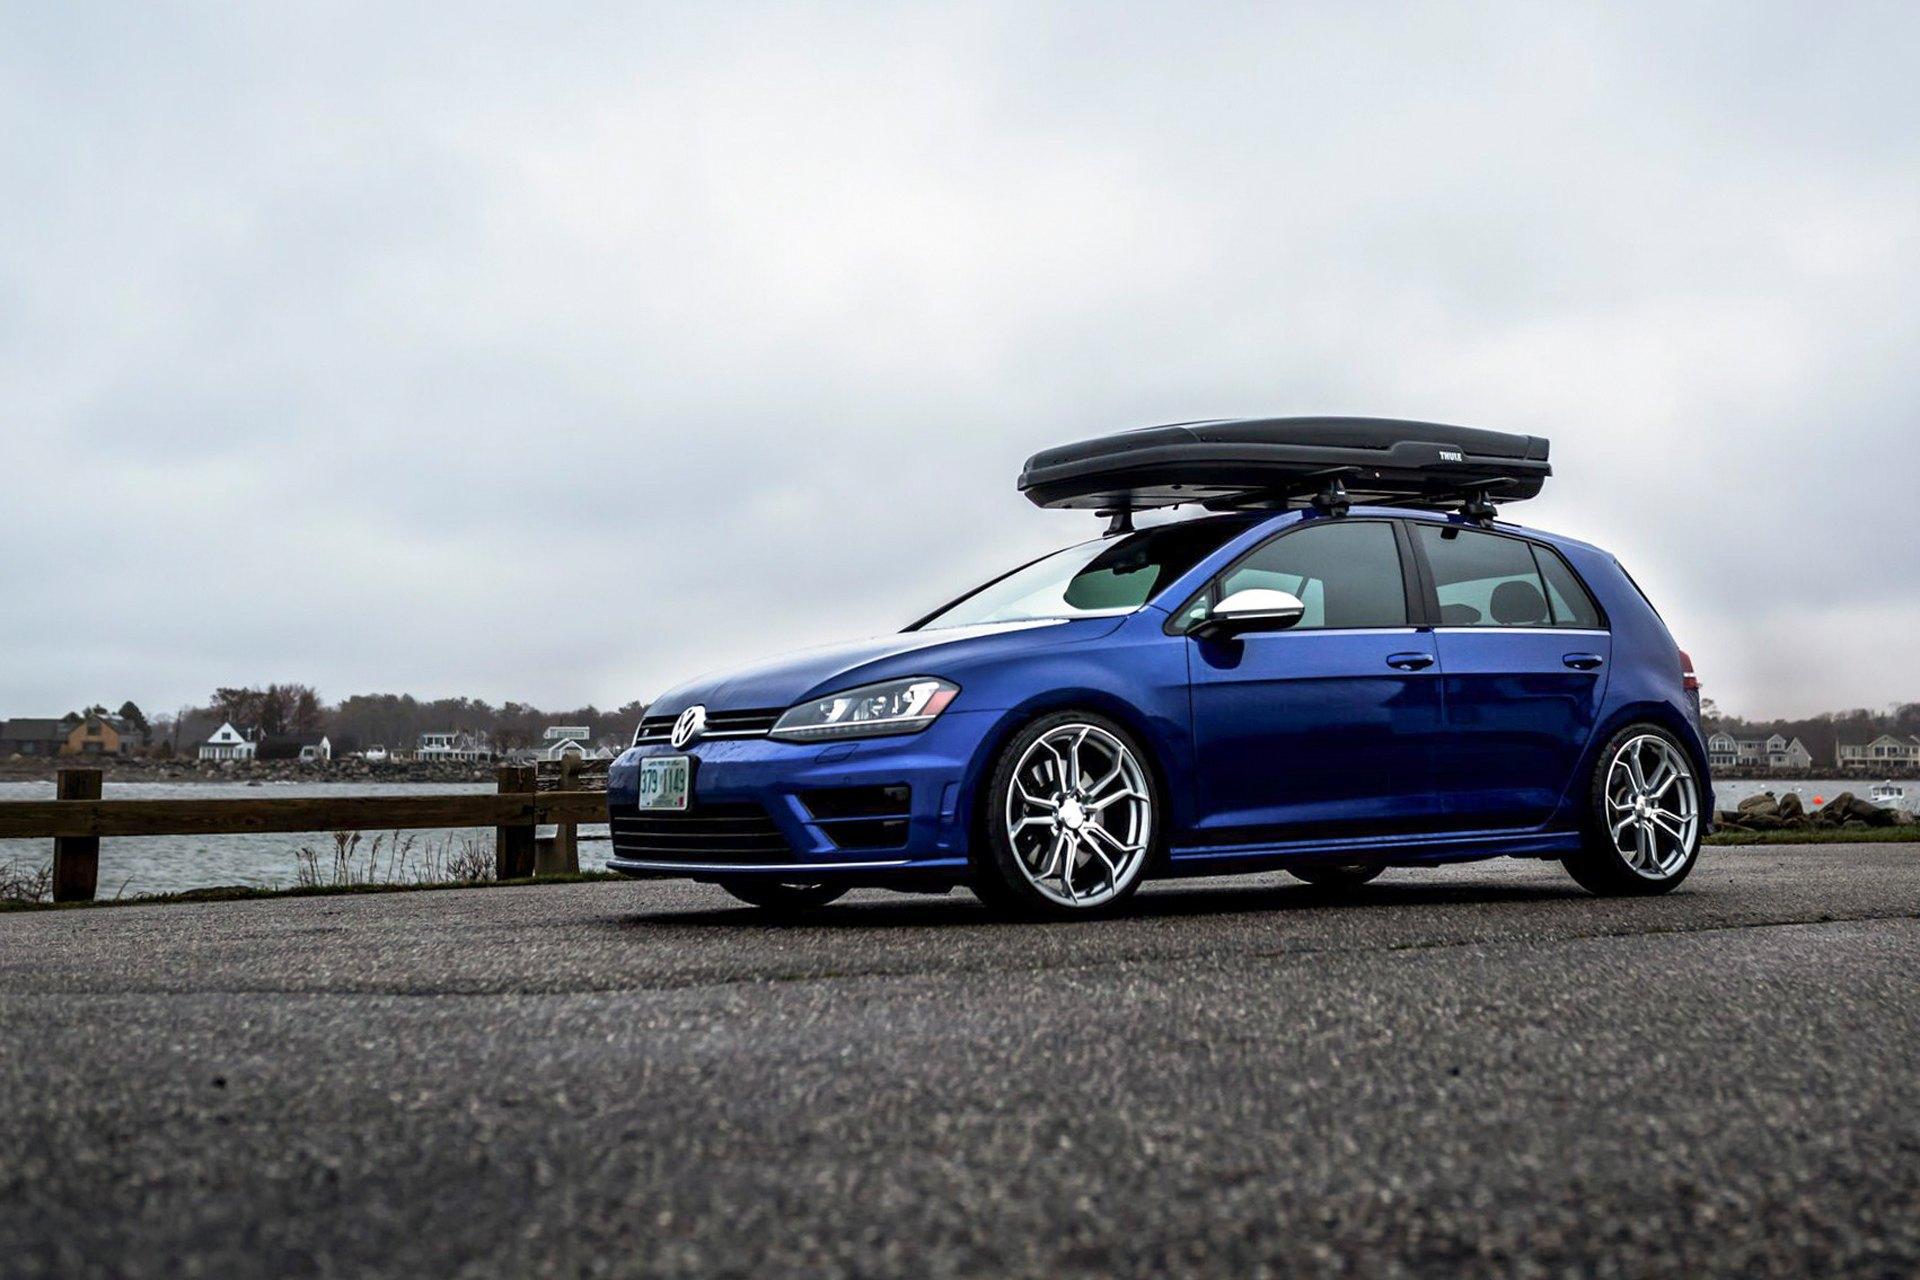 Rolls Royce Golf Cart >> Custom 2015 Volkswagen Golf | Images, Mods, Photos, Upgrades — CARiD.com Gallery